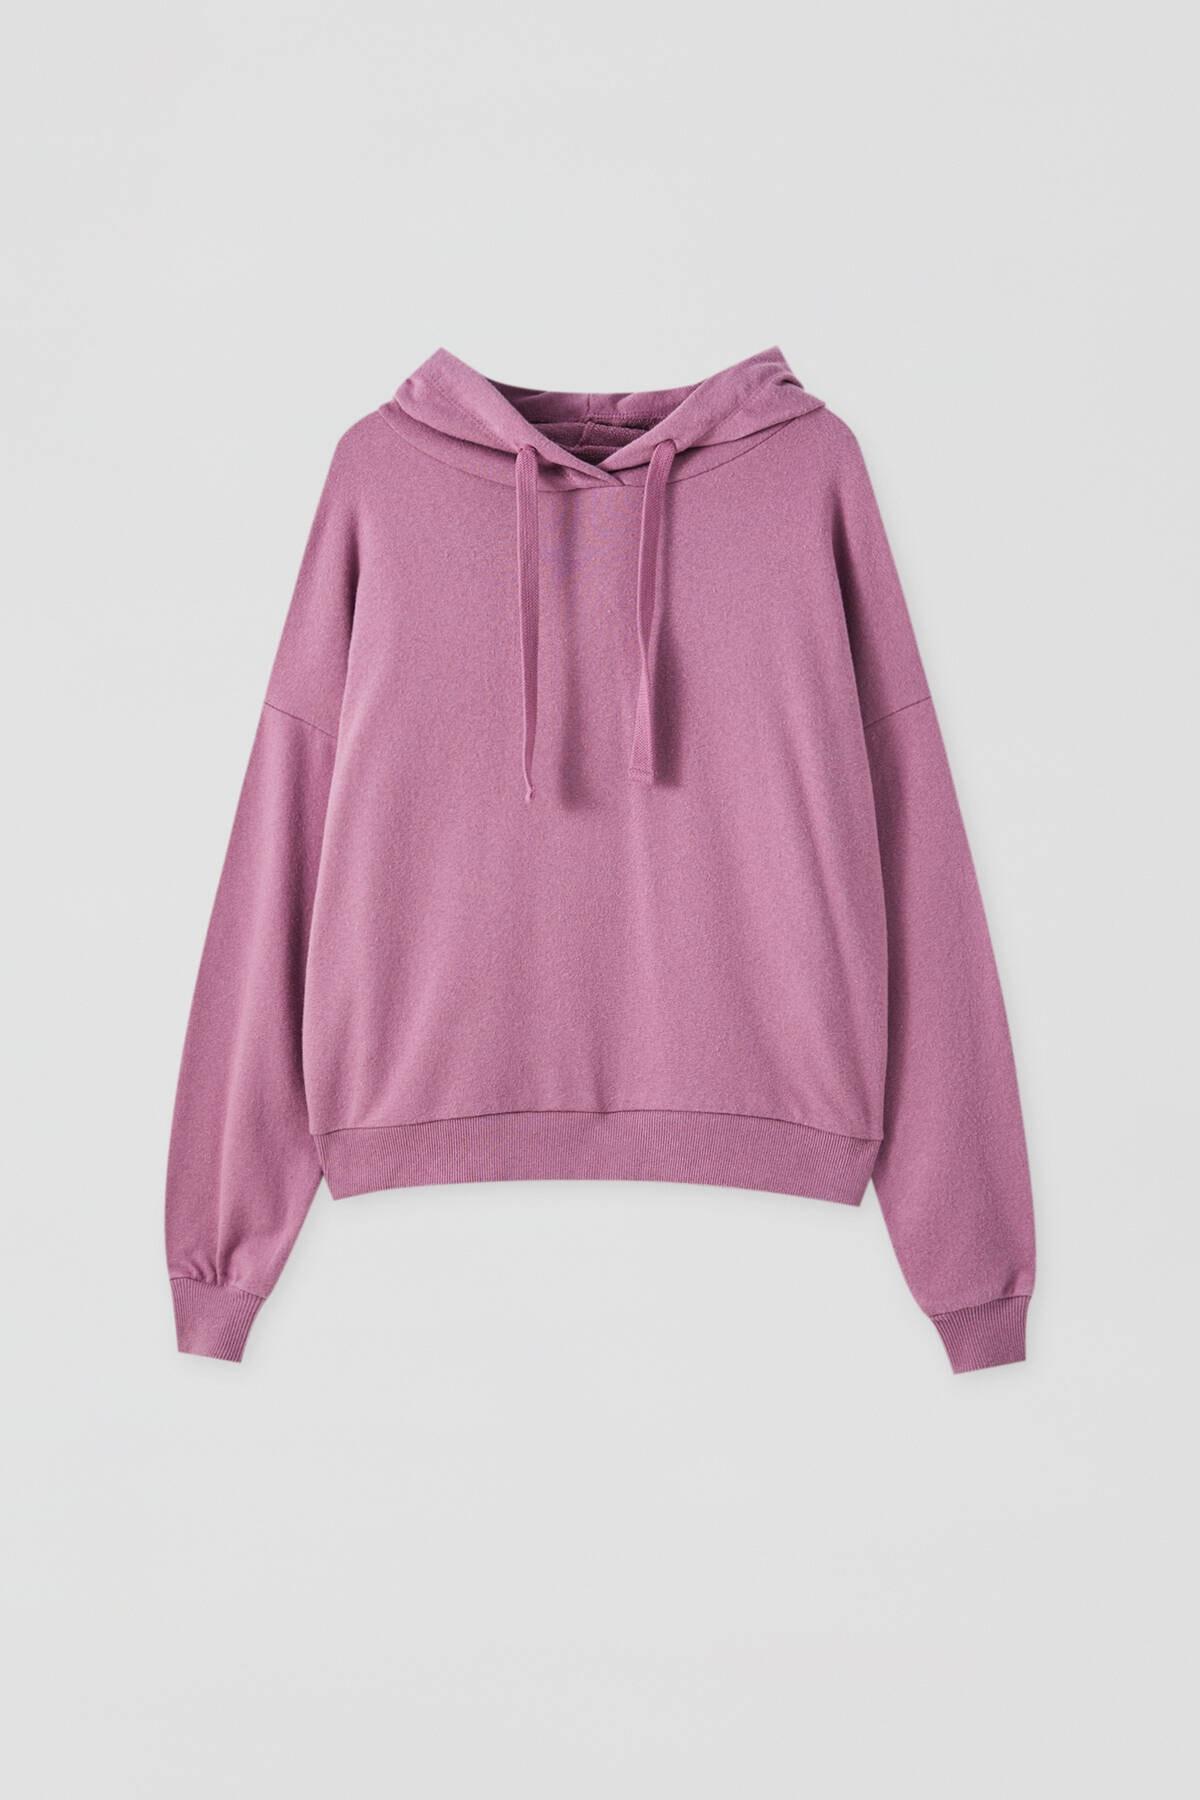 Pull & Bear Kadın Mor Renkli Kapüşonlu Sweatshirt 09594312 4